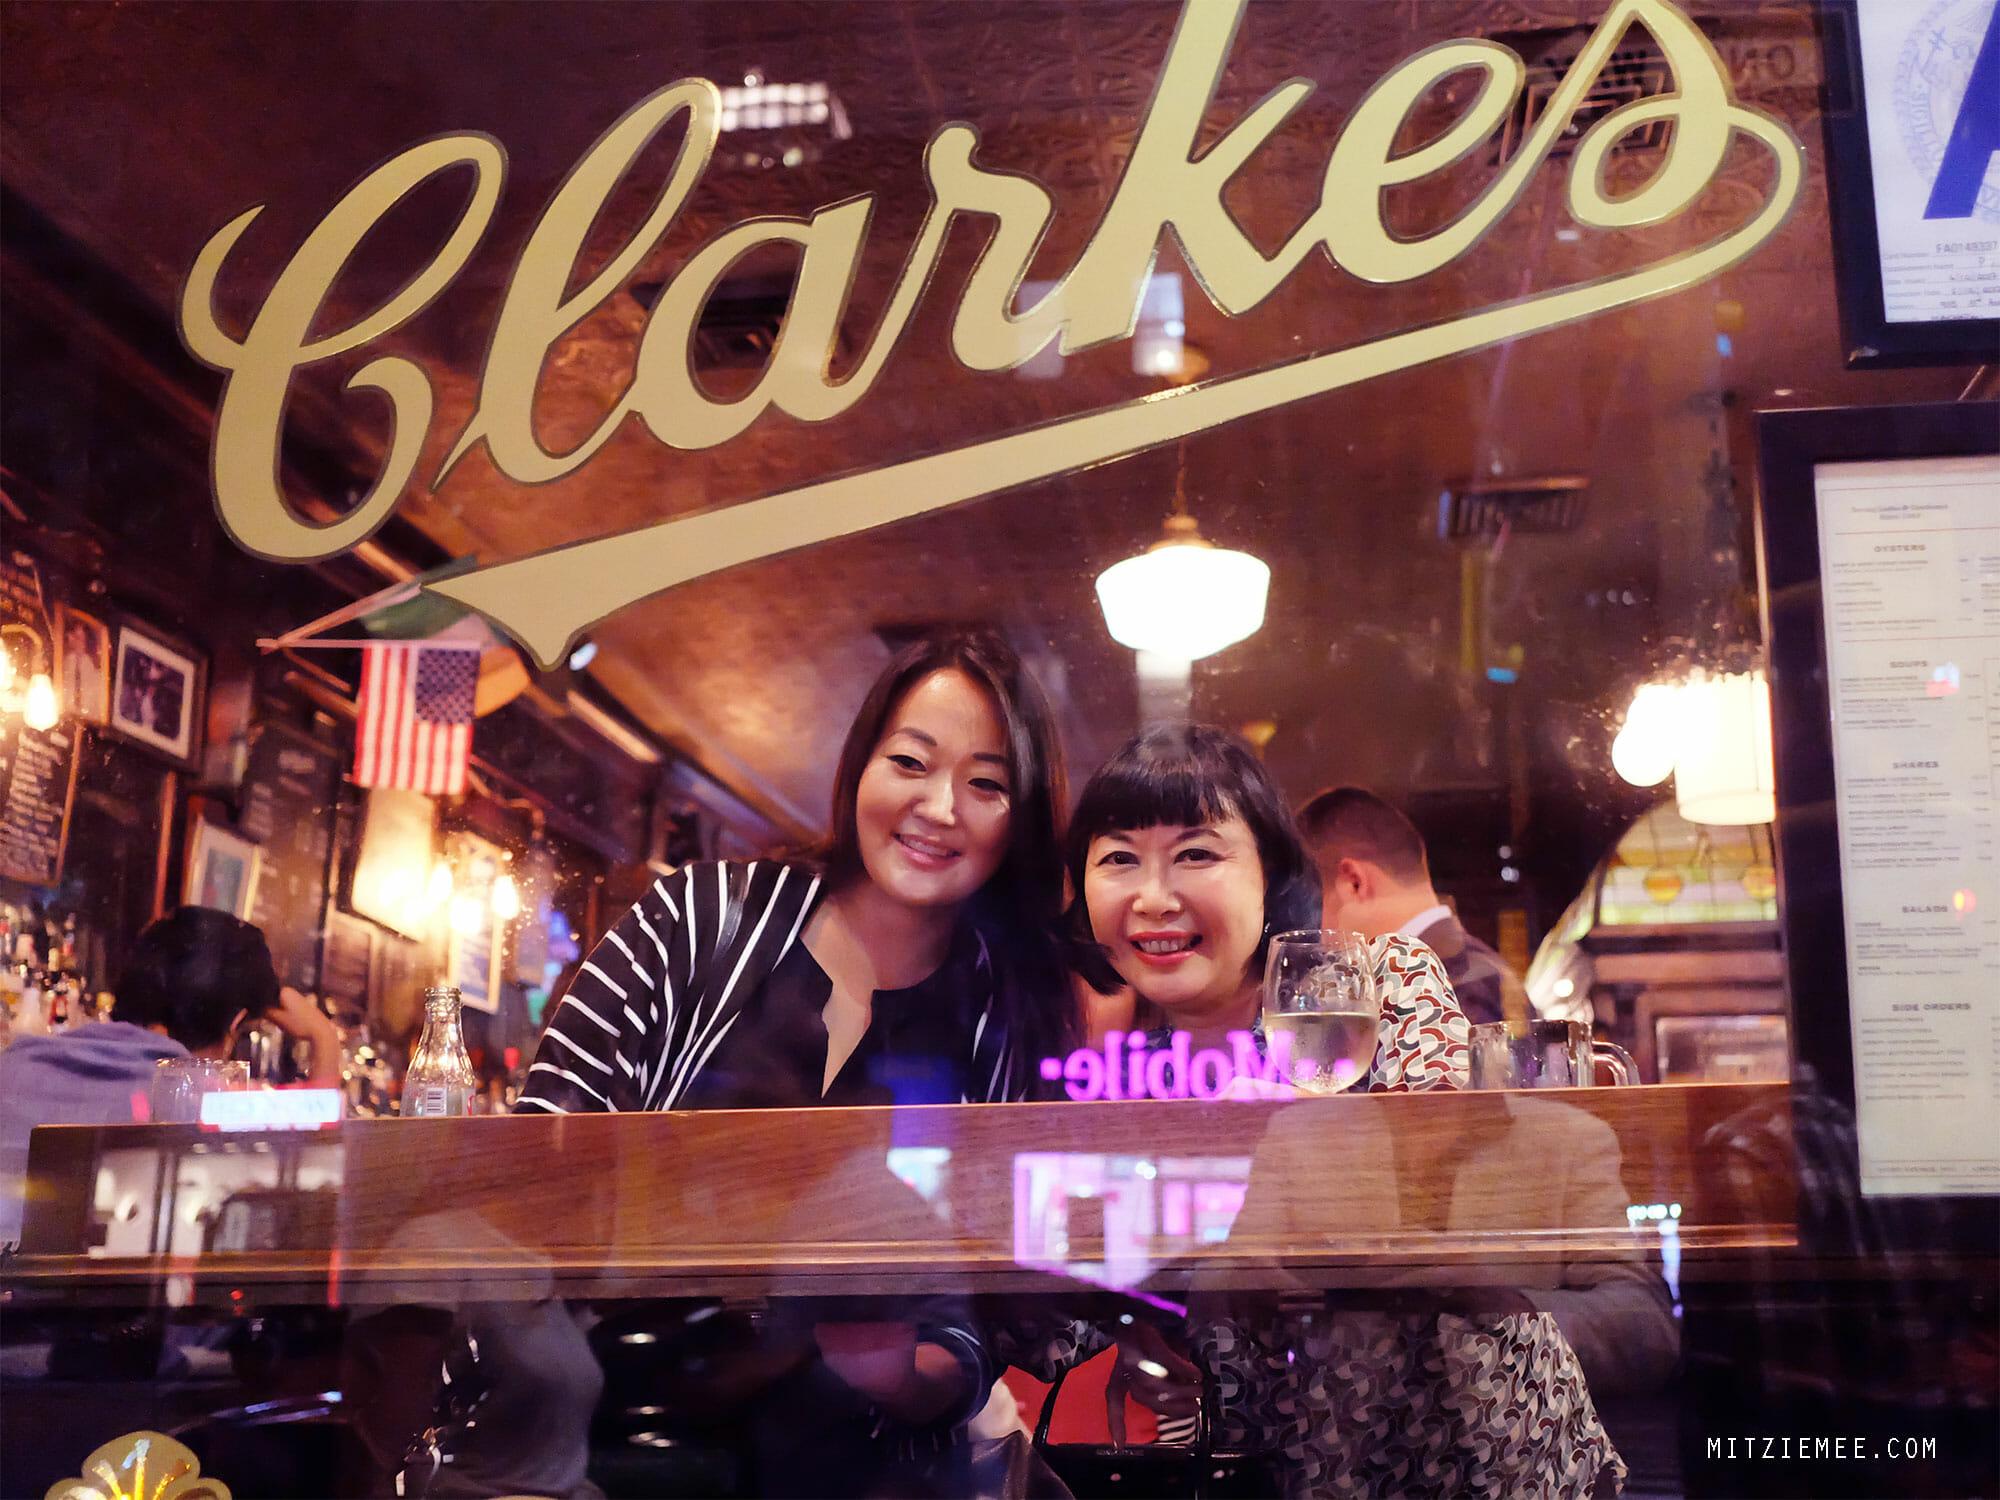 P.J. Clarke's, classic bar in New York City